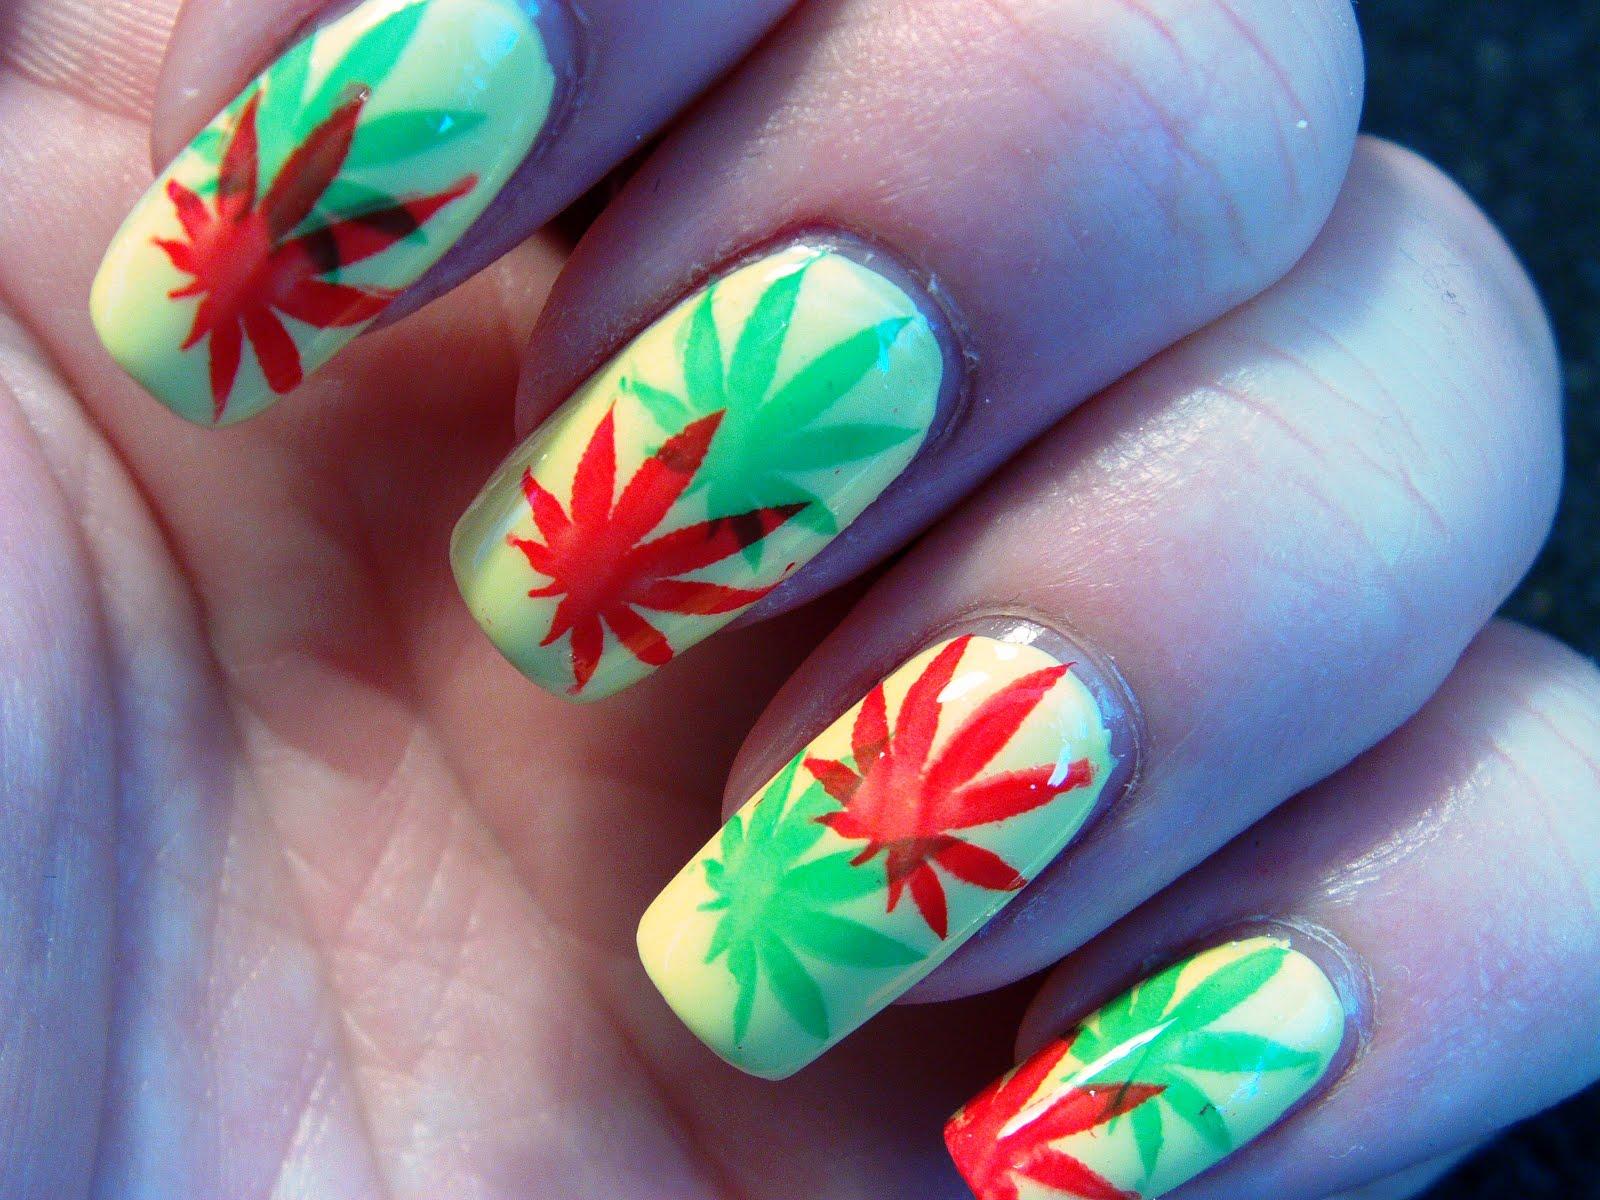 Marihuana in rasta colors 6 rasta nail designs woman fashion max size 1600 x 1200 prinsesfo Choice Image